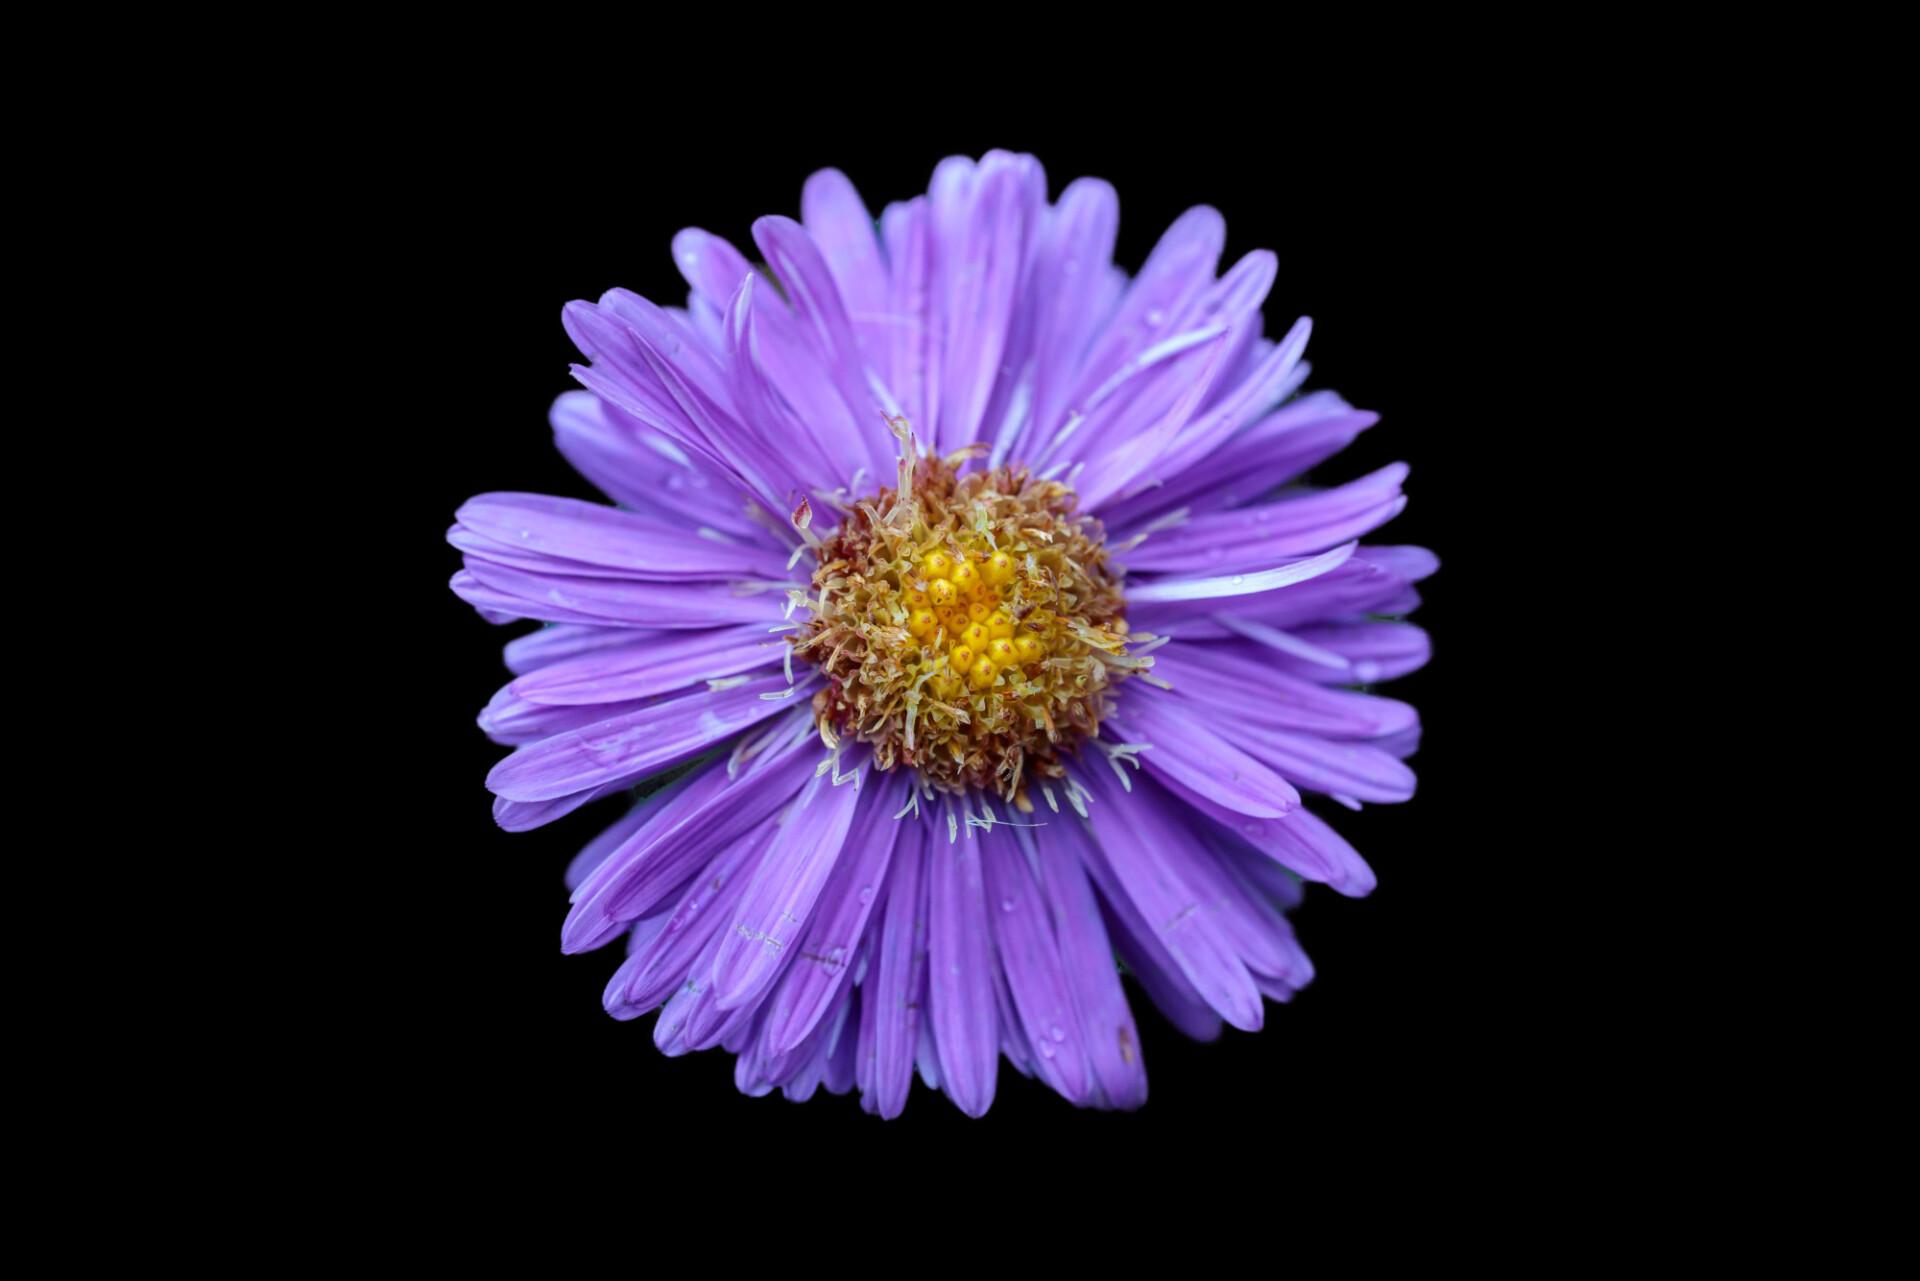 aster flower blackbackground